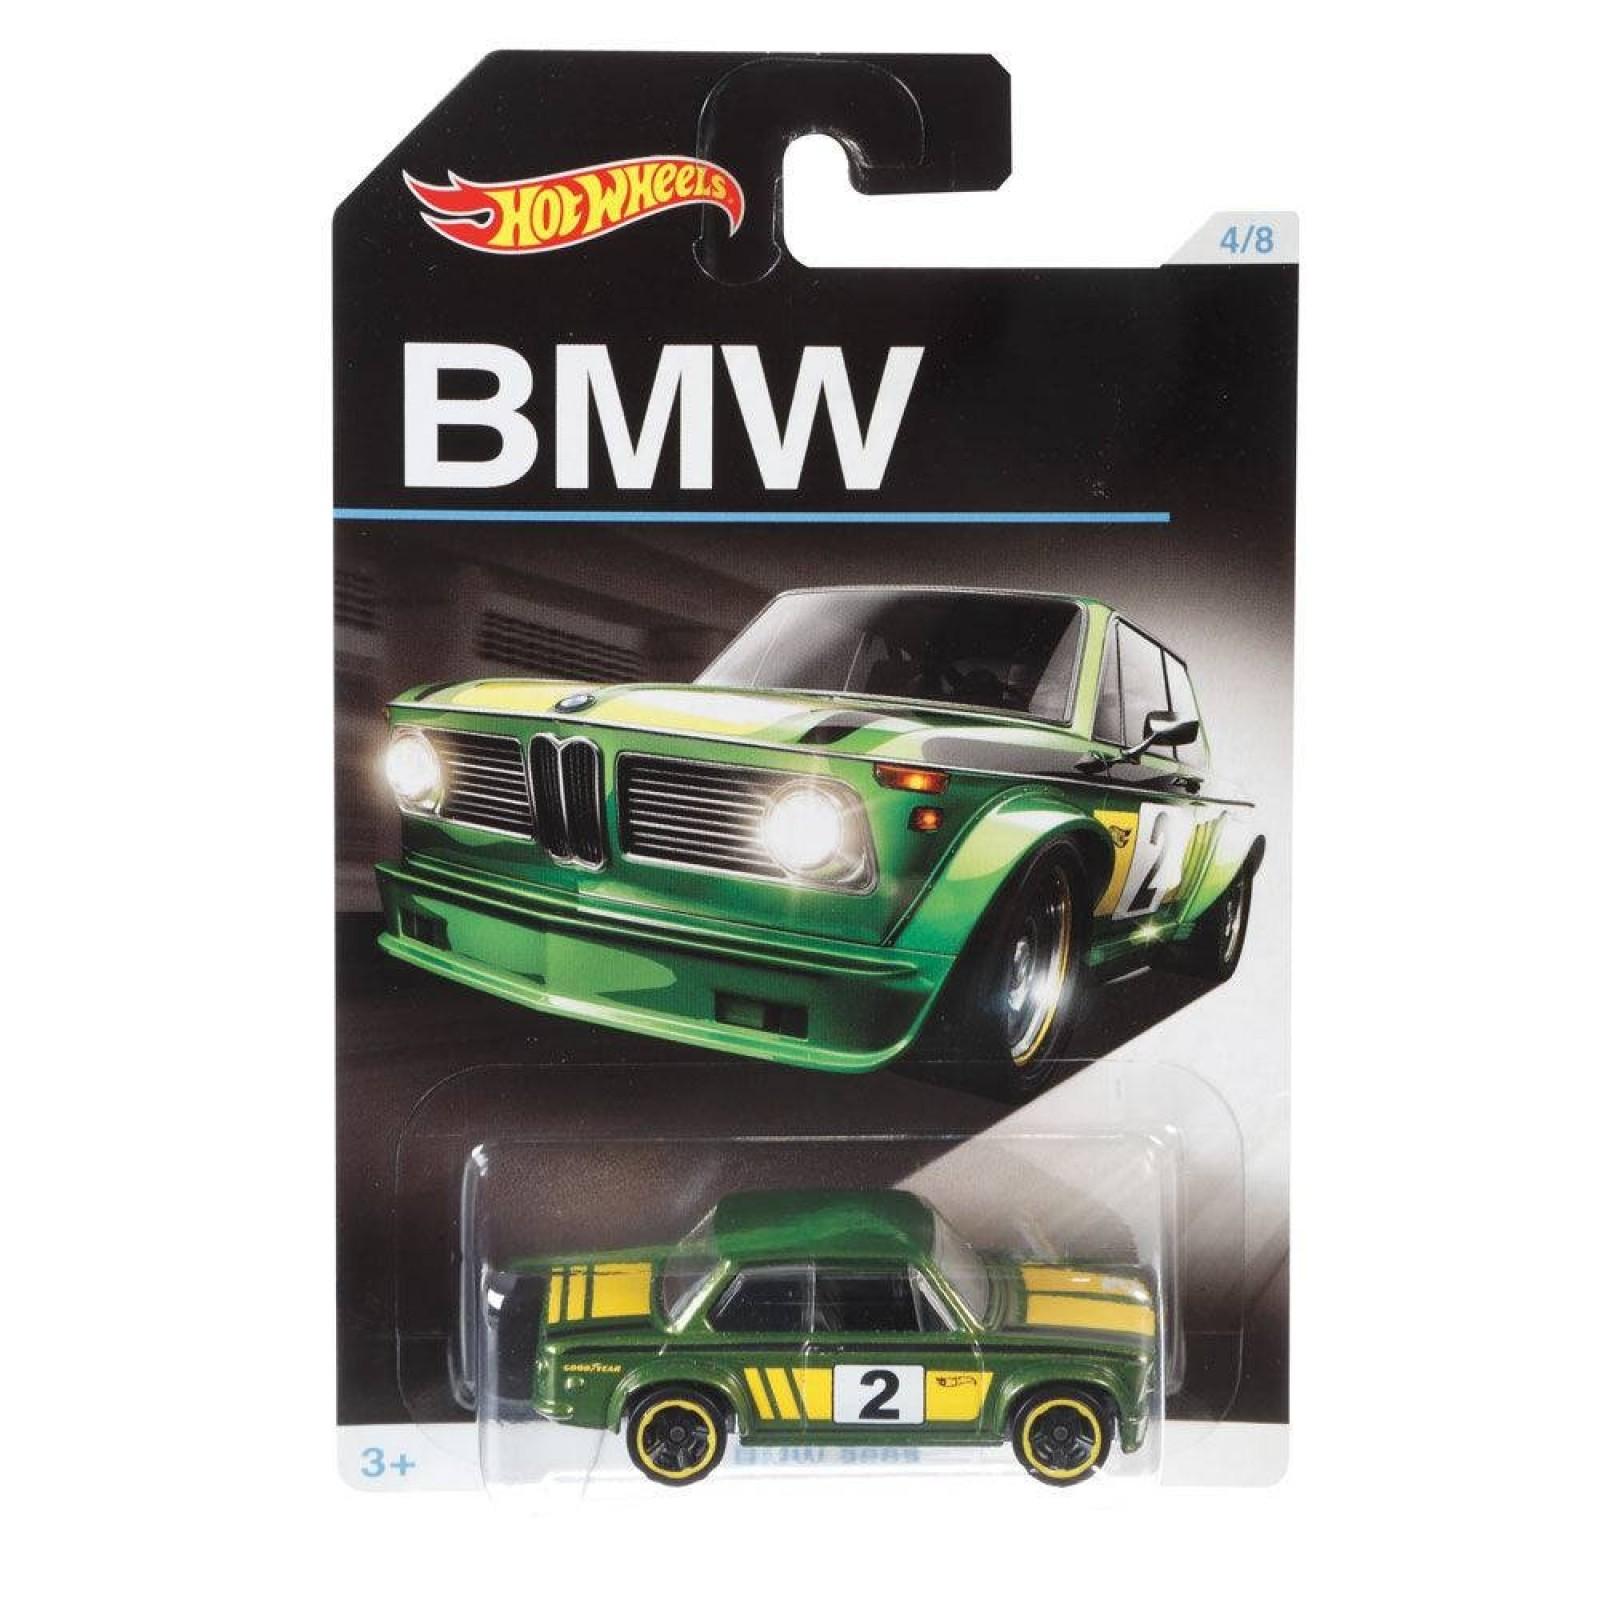 Hot Wheels - BMW 2002 - DJM83